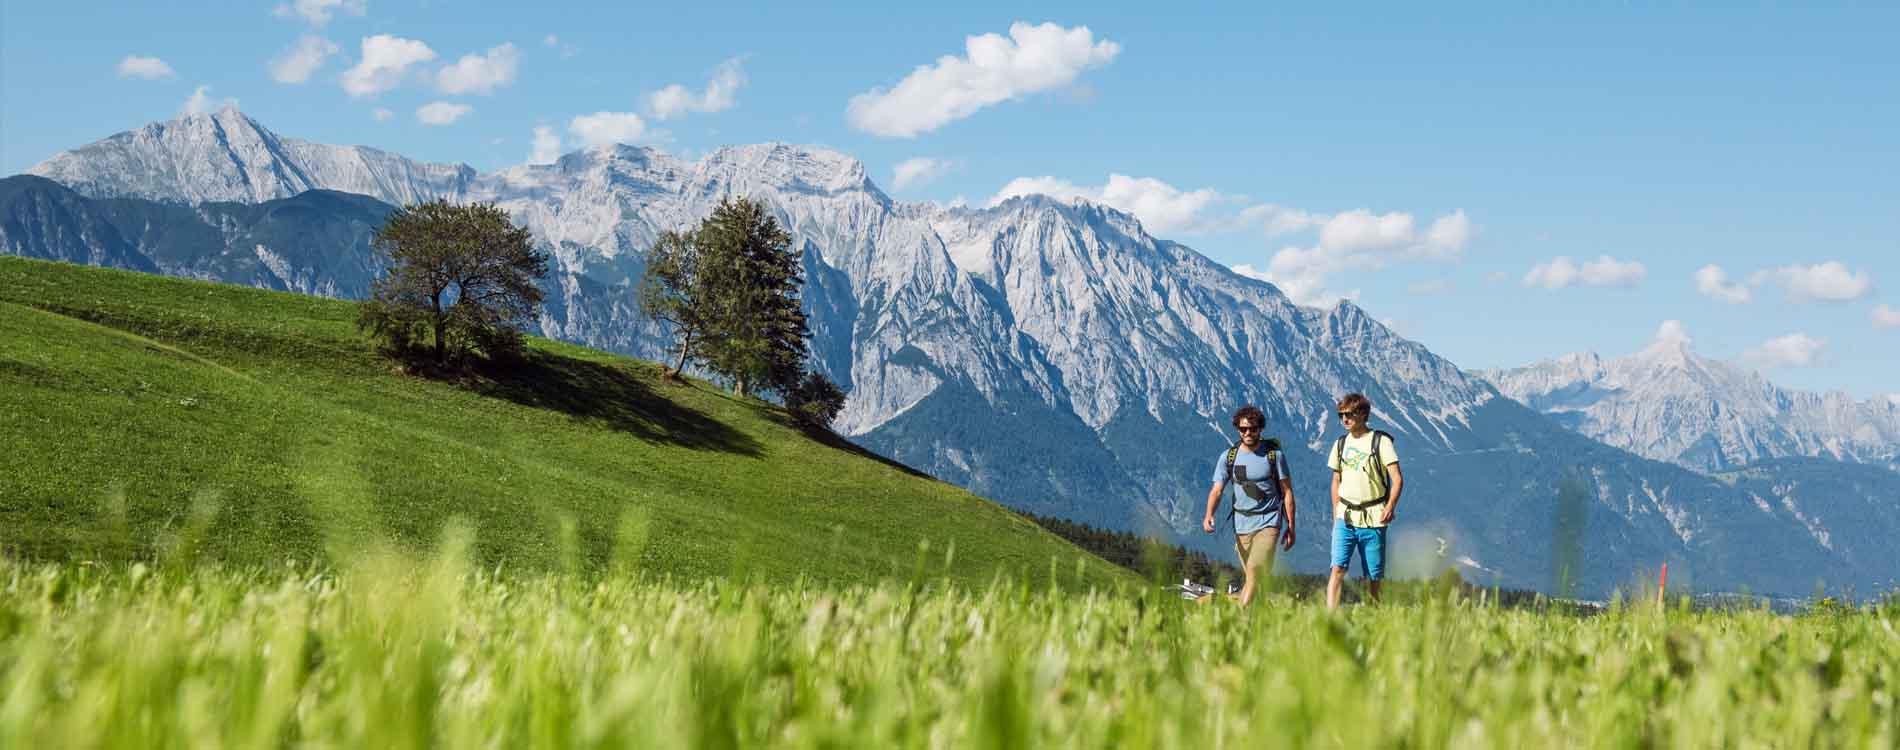 Summer Short Stay Programme Mayr Park Igls Mayr Clinic Austria Niche Destinations